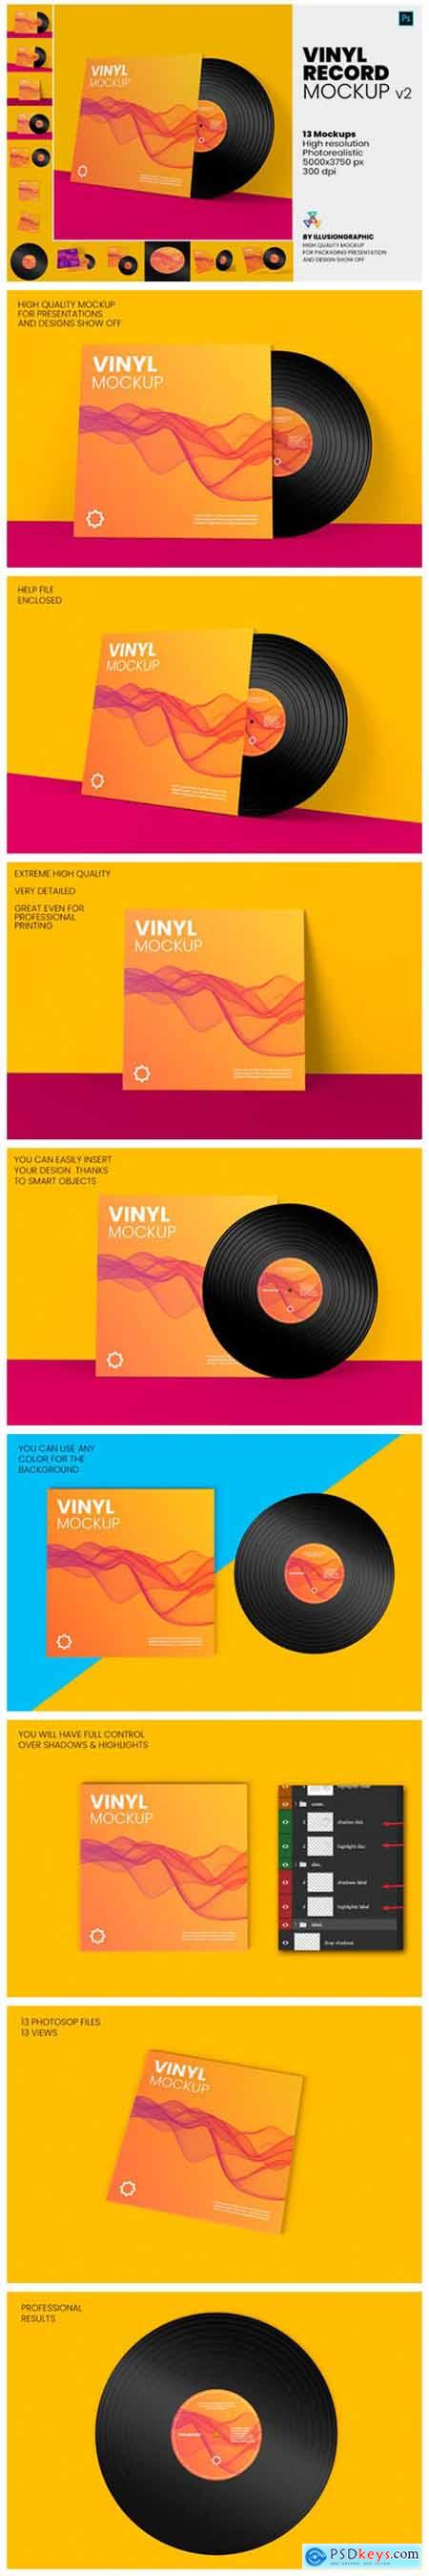 Vinyl Record Mockup V.2 - 13 Views 8444045